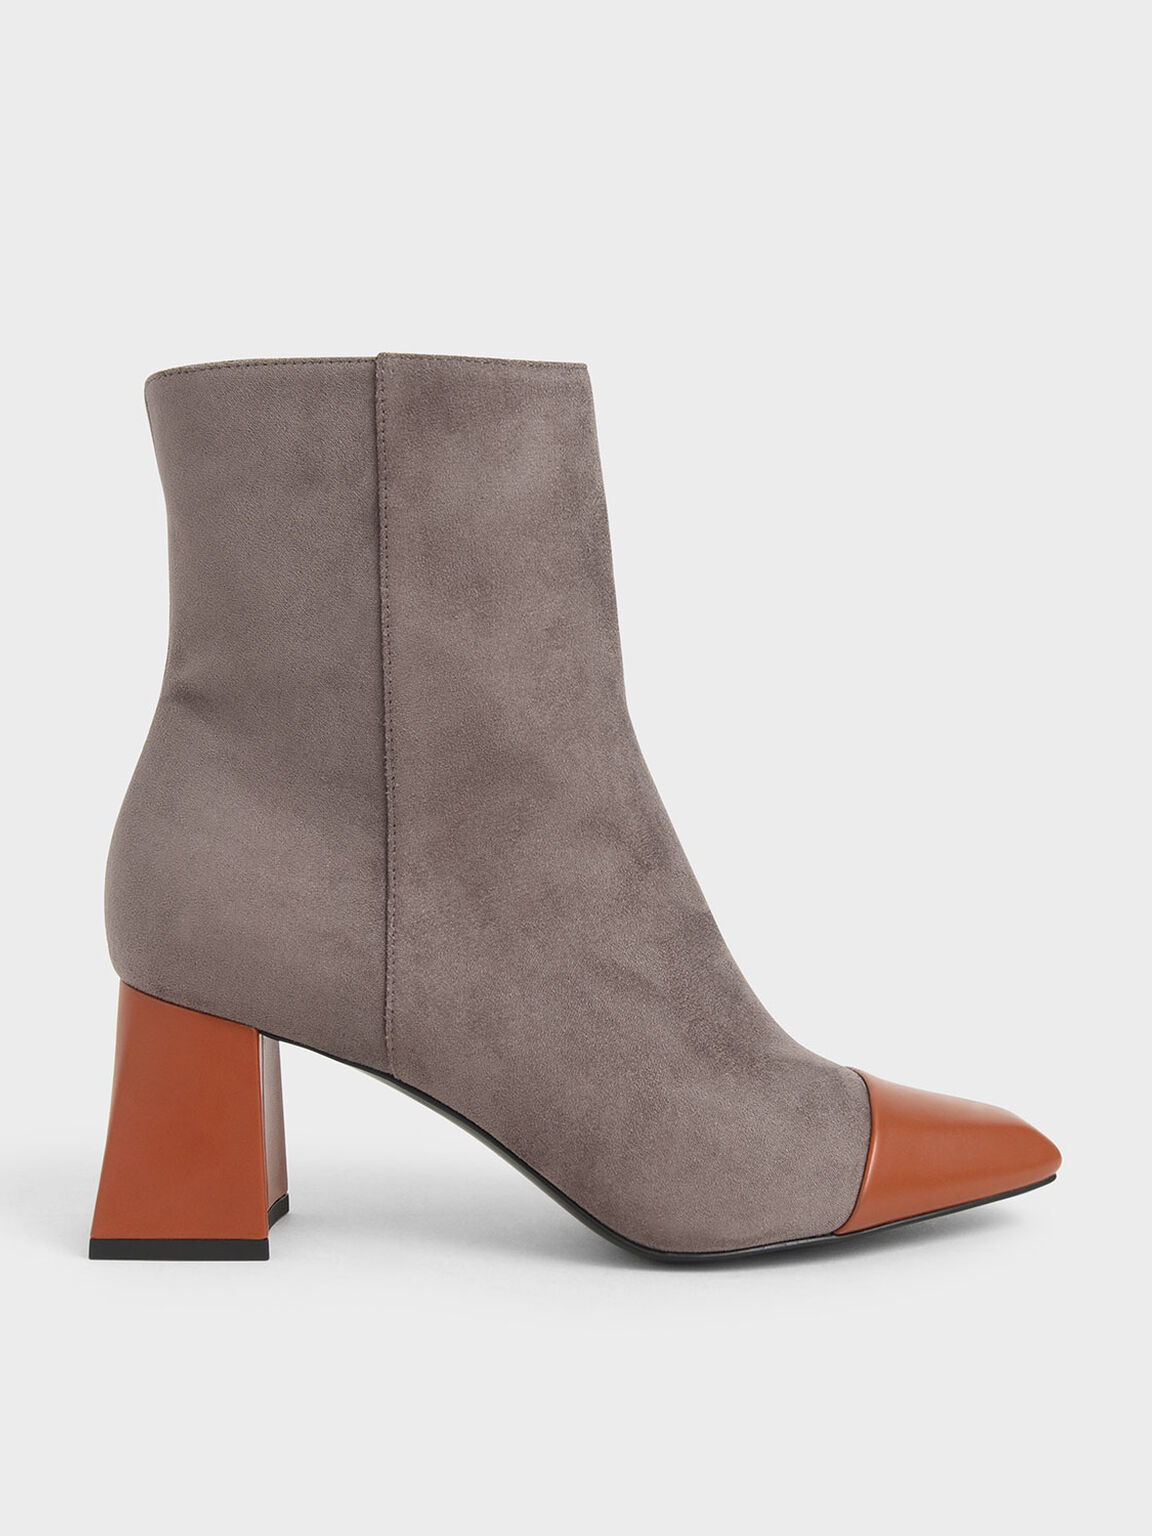 Two-Tone Textured Calf Boots, Dark Brown, hi-res